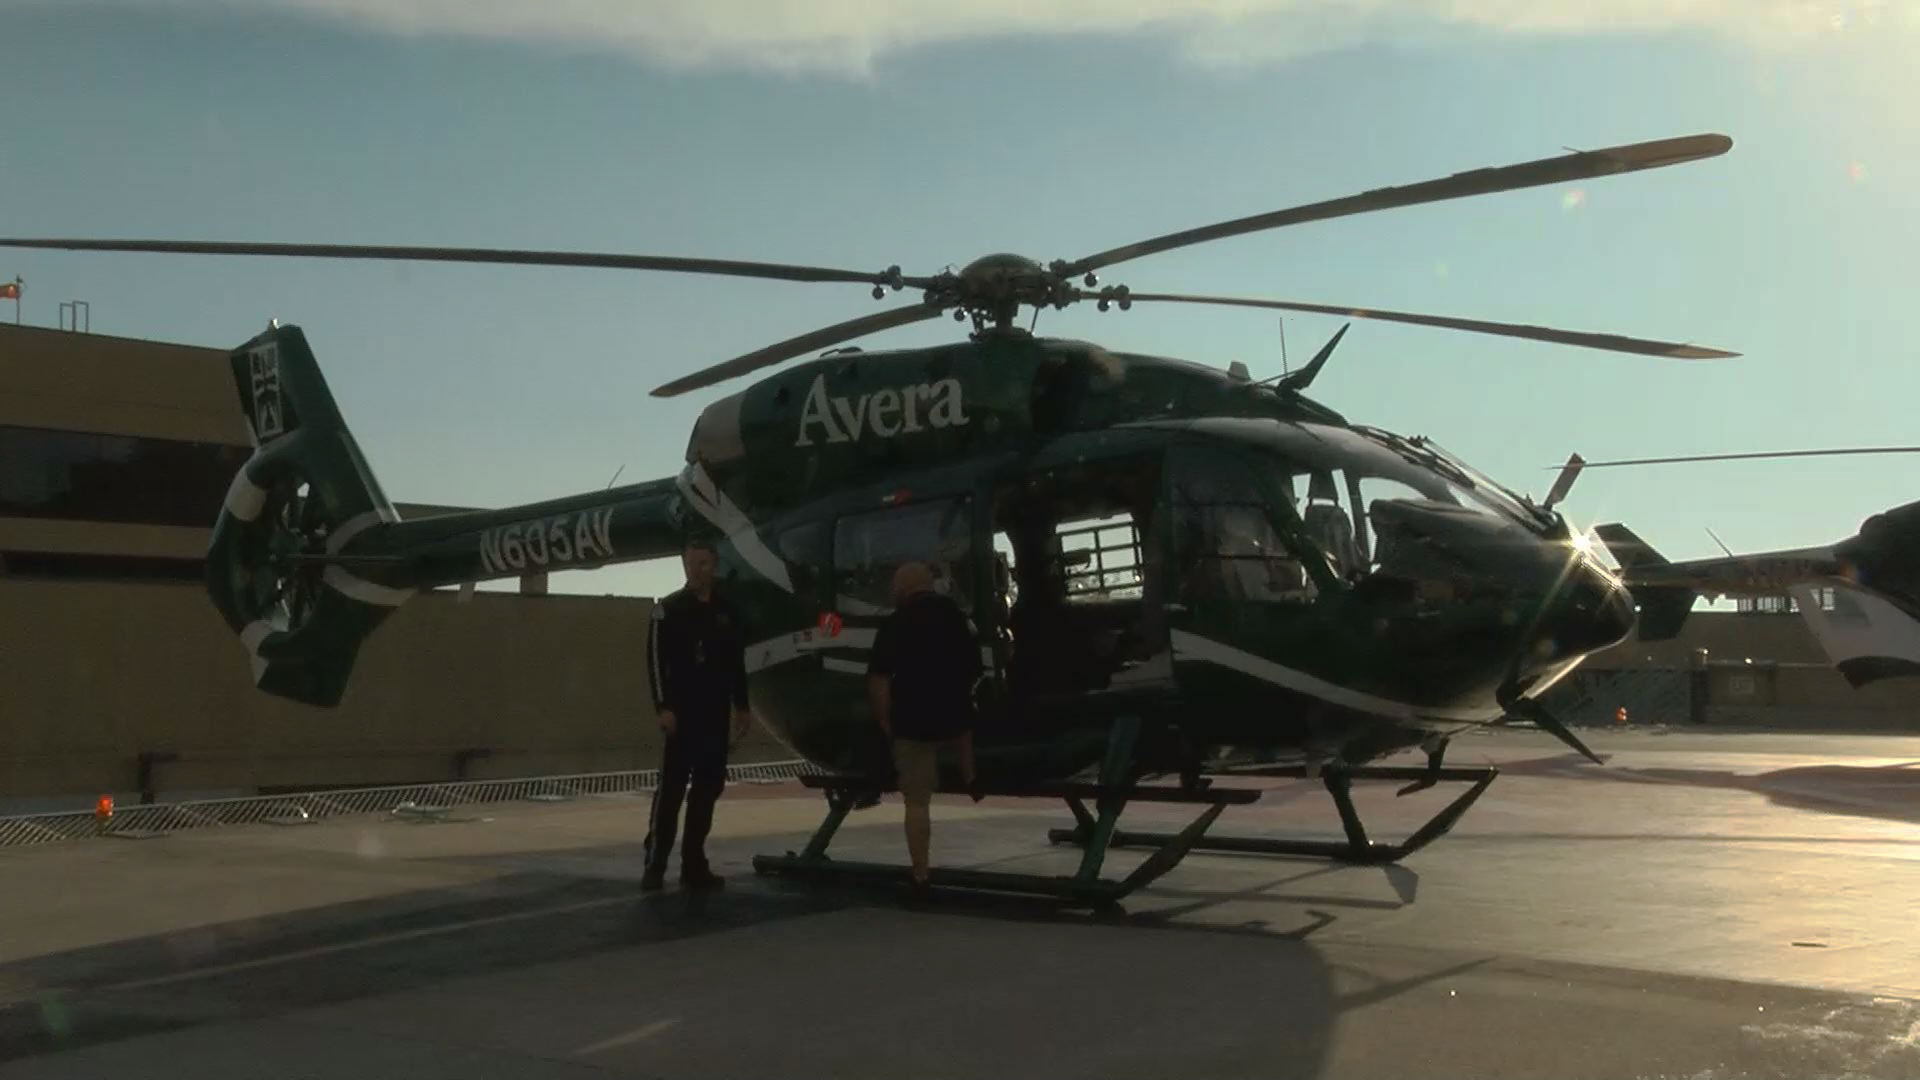 KELO Avera Helicopter